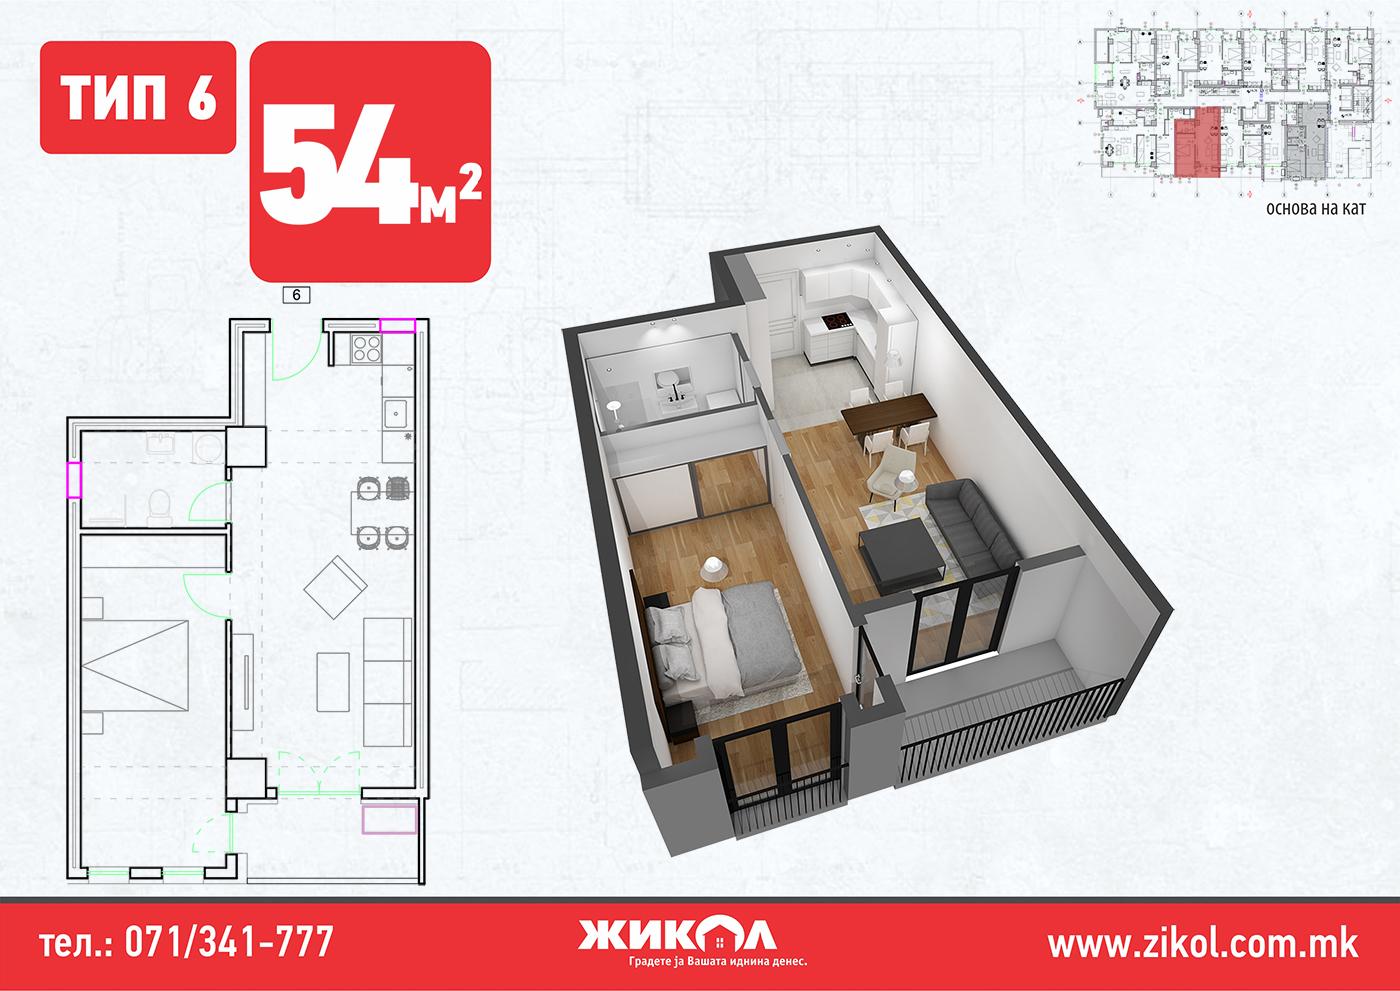 Зграда 55, кат 10, стан 96